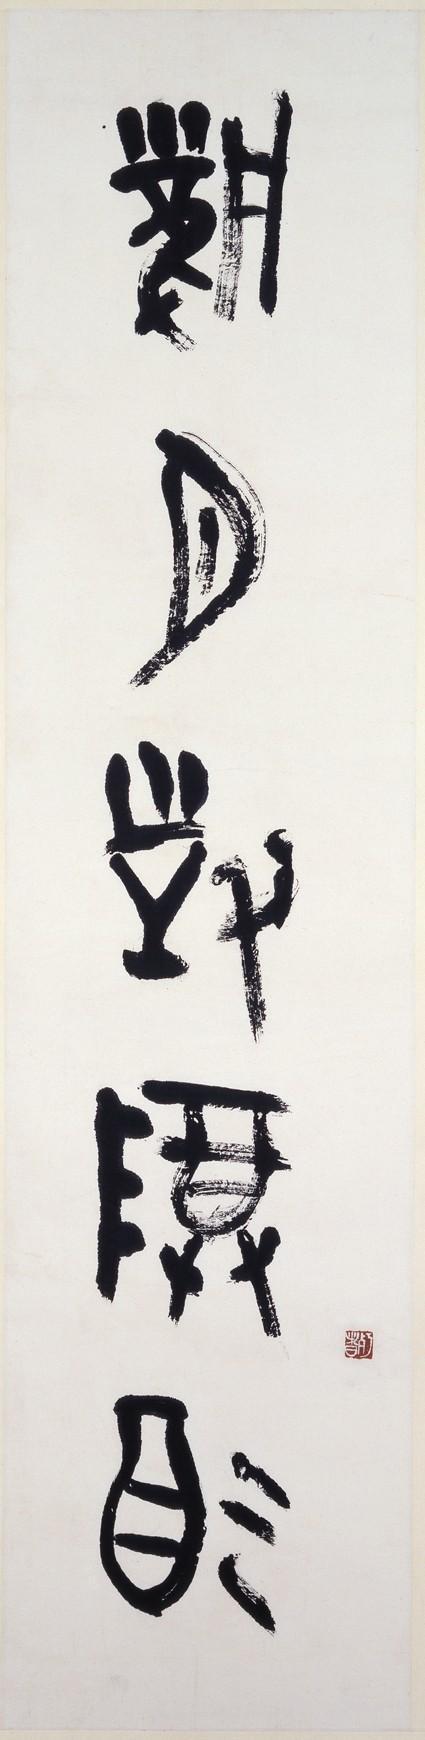 Calligraphy written in archaic scriptfront